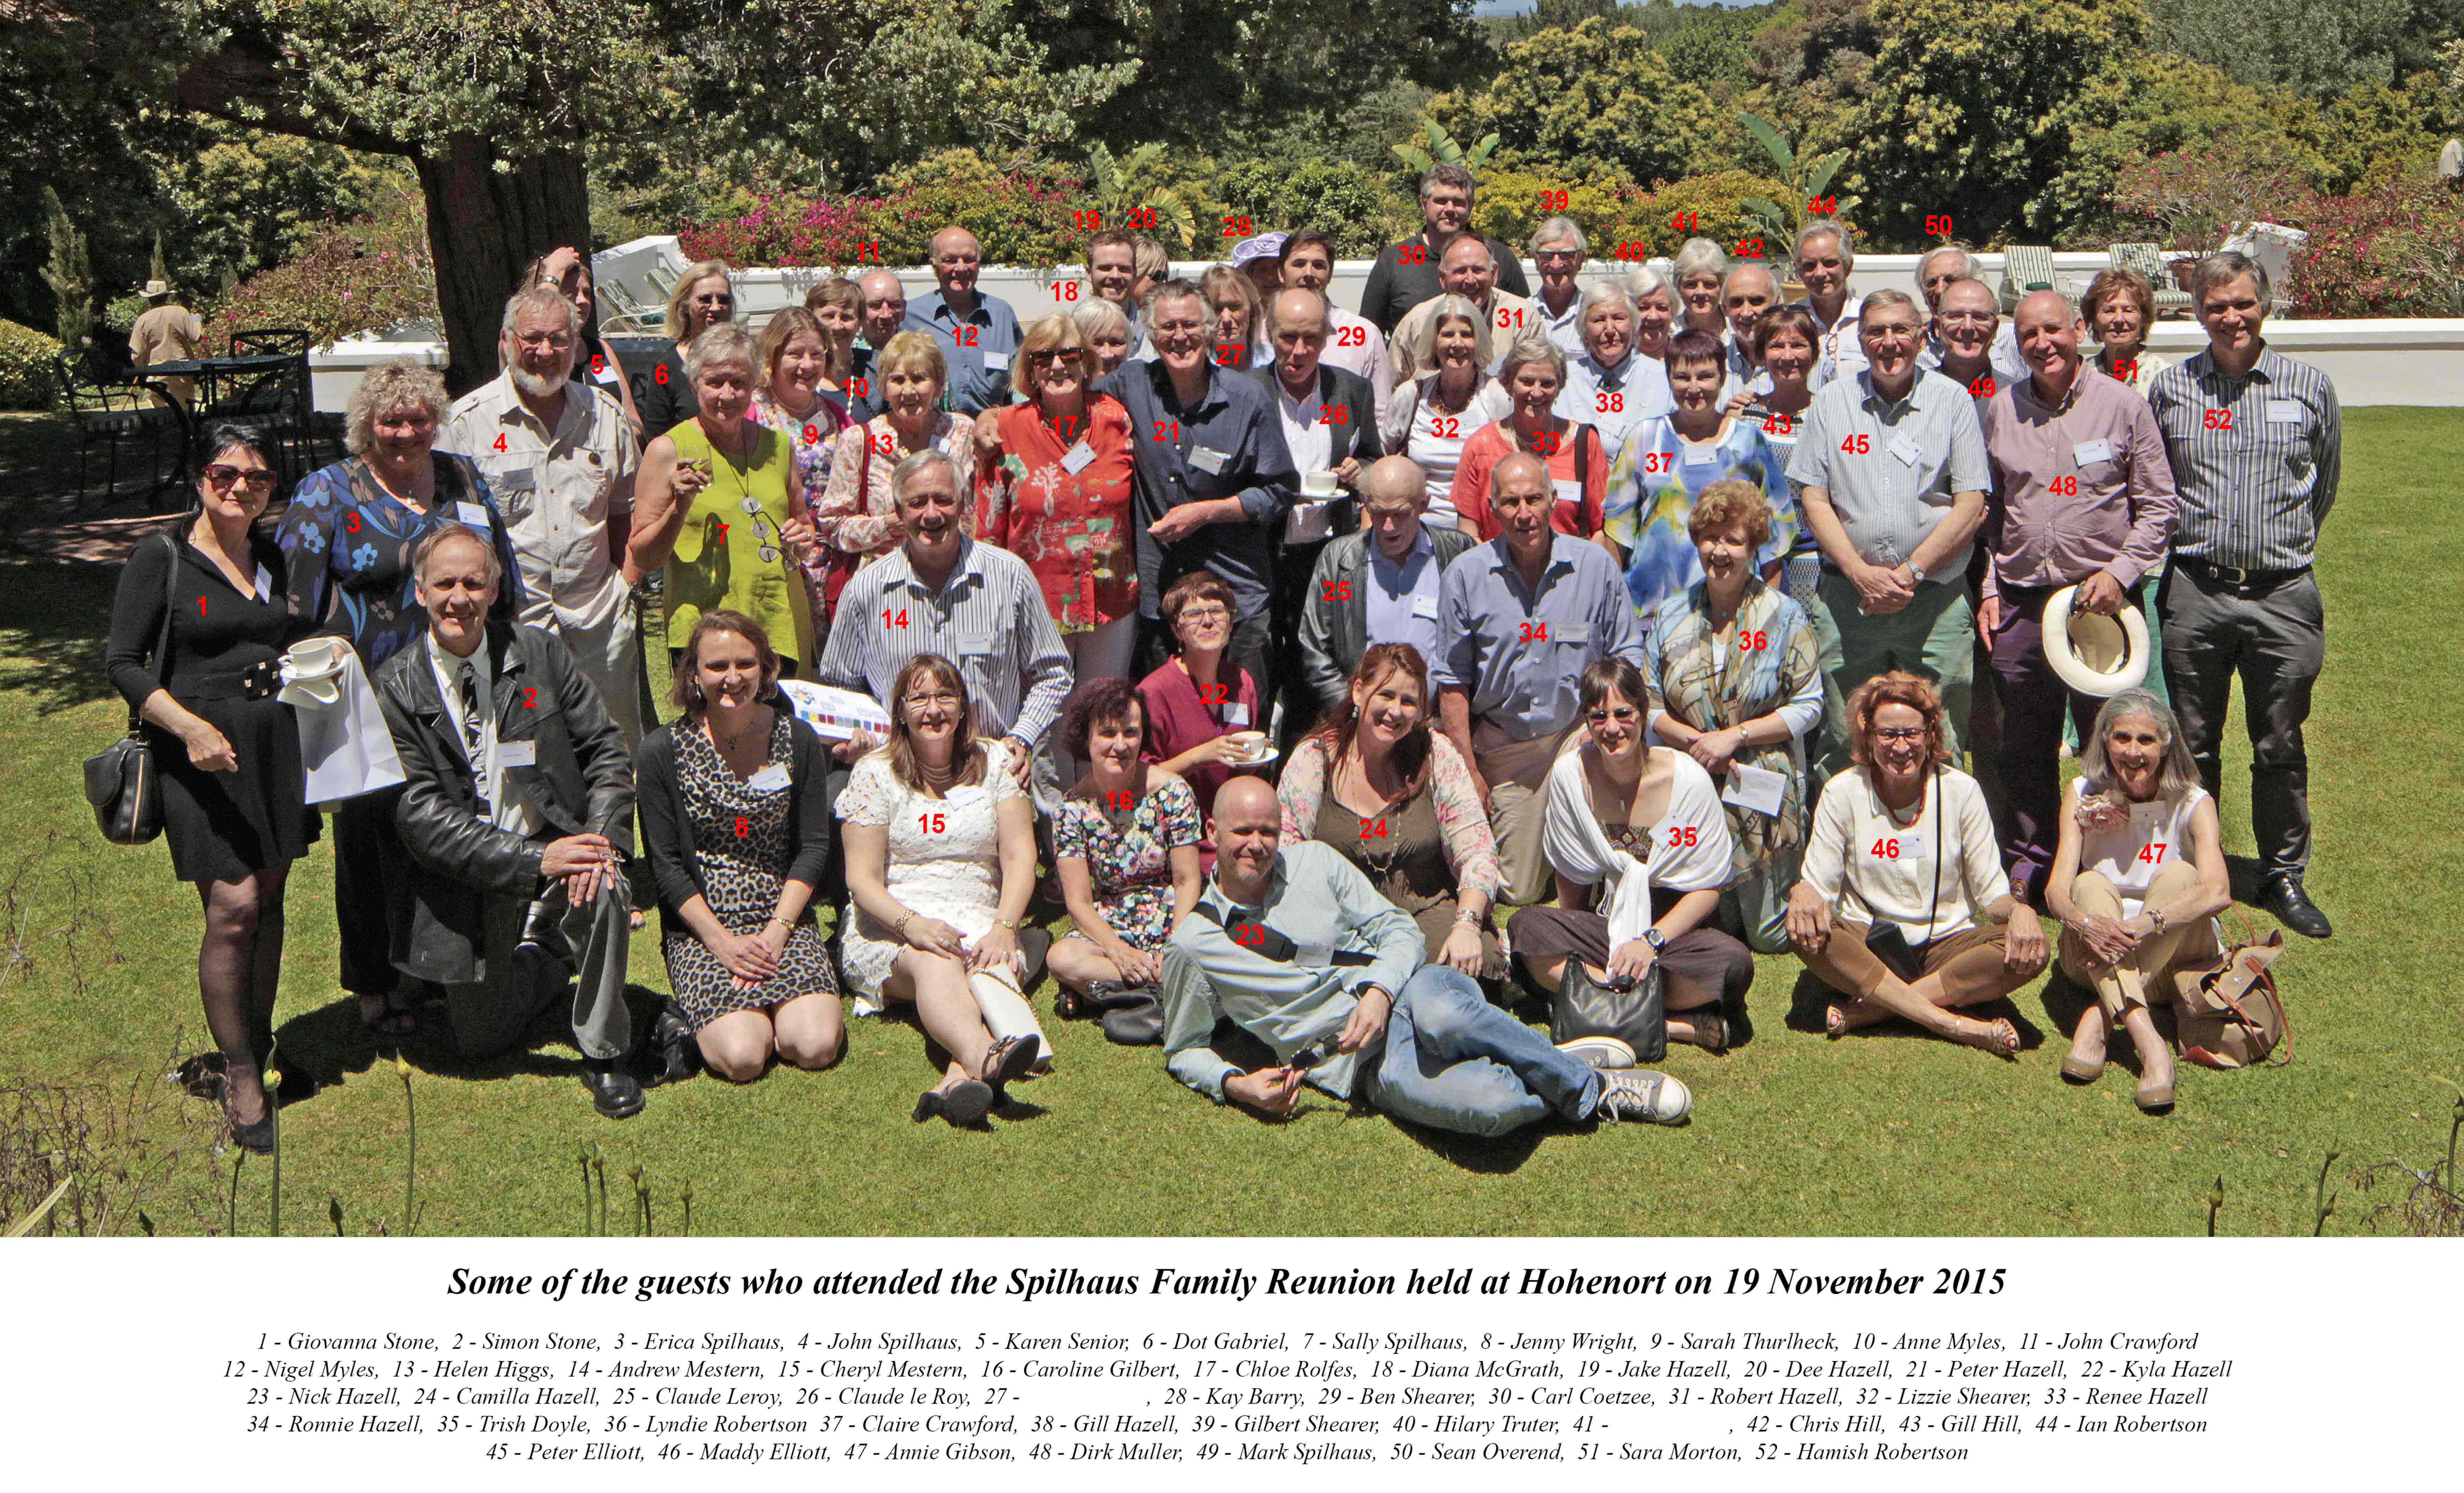 illiams held family reunion - HD7087×4294